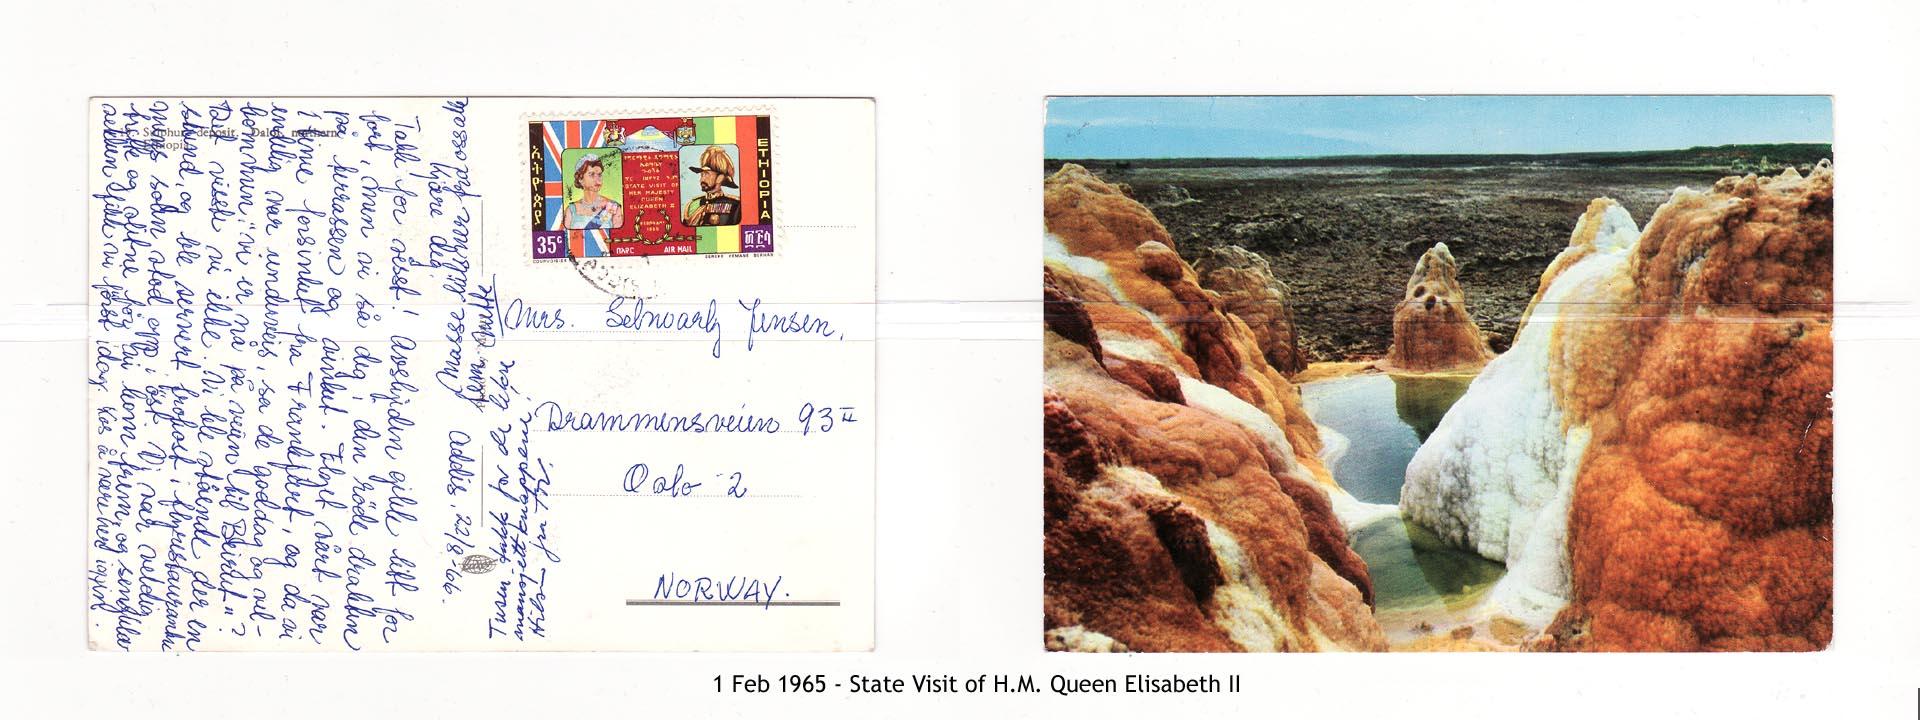 19650201 – State Visit of H.M. Queen Elisabeth II